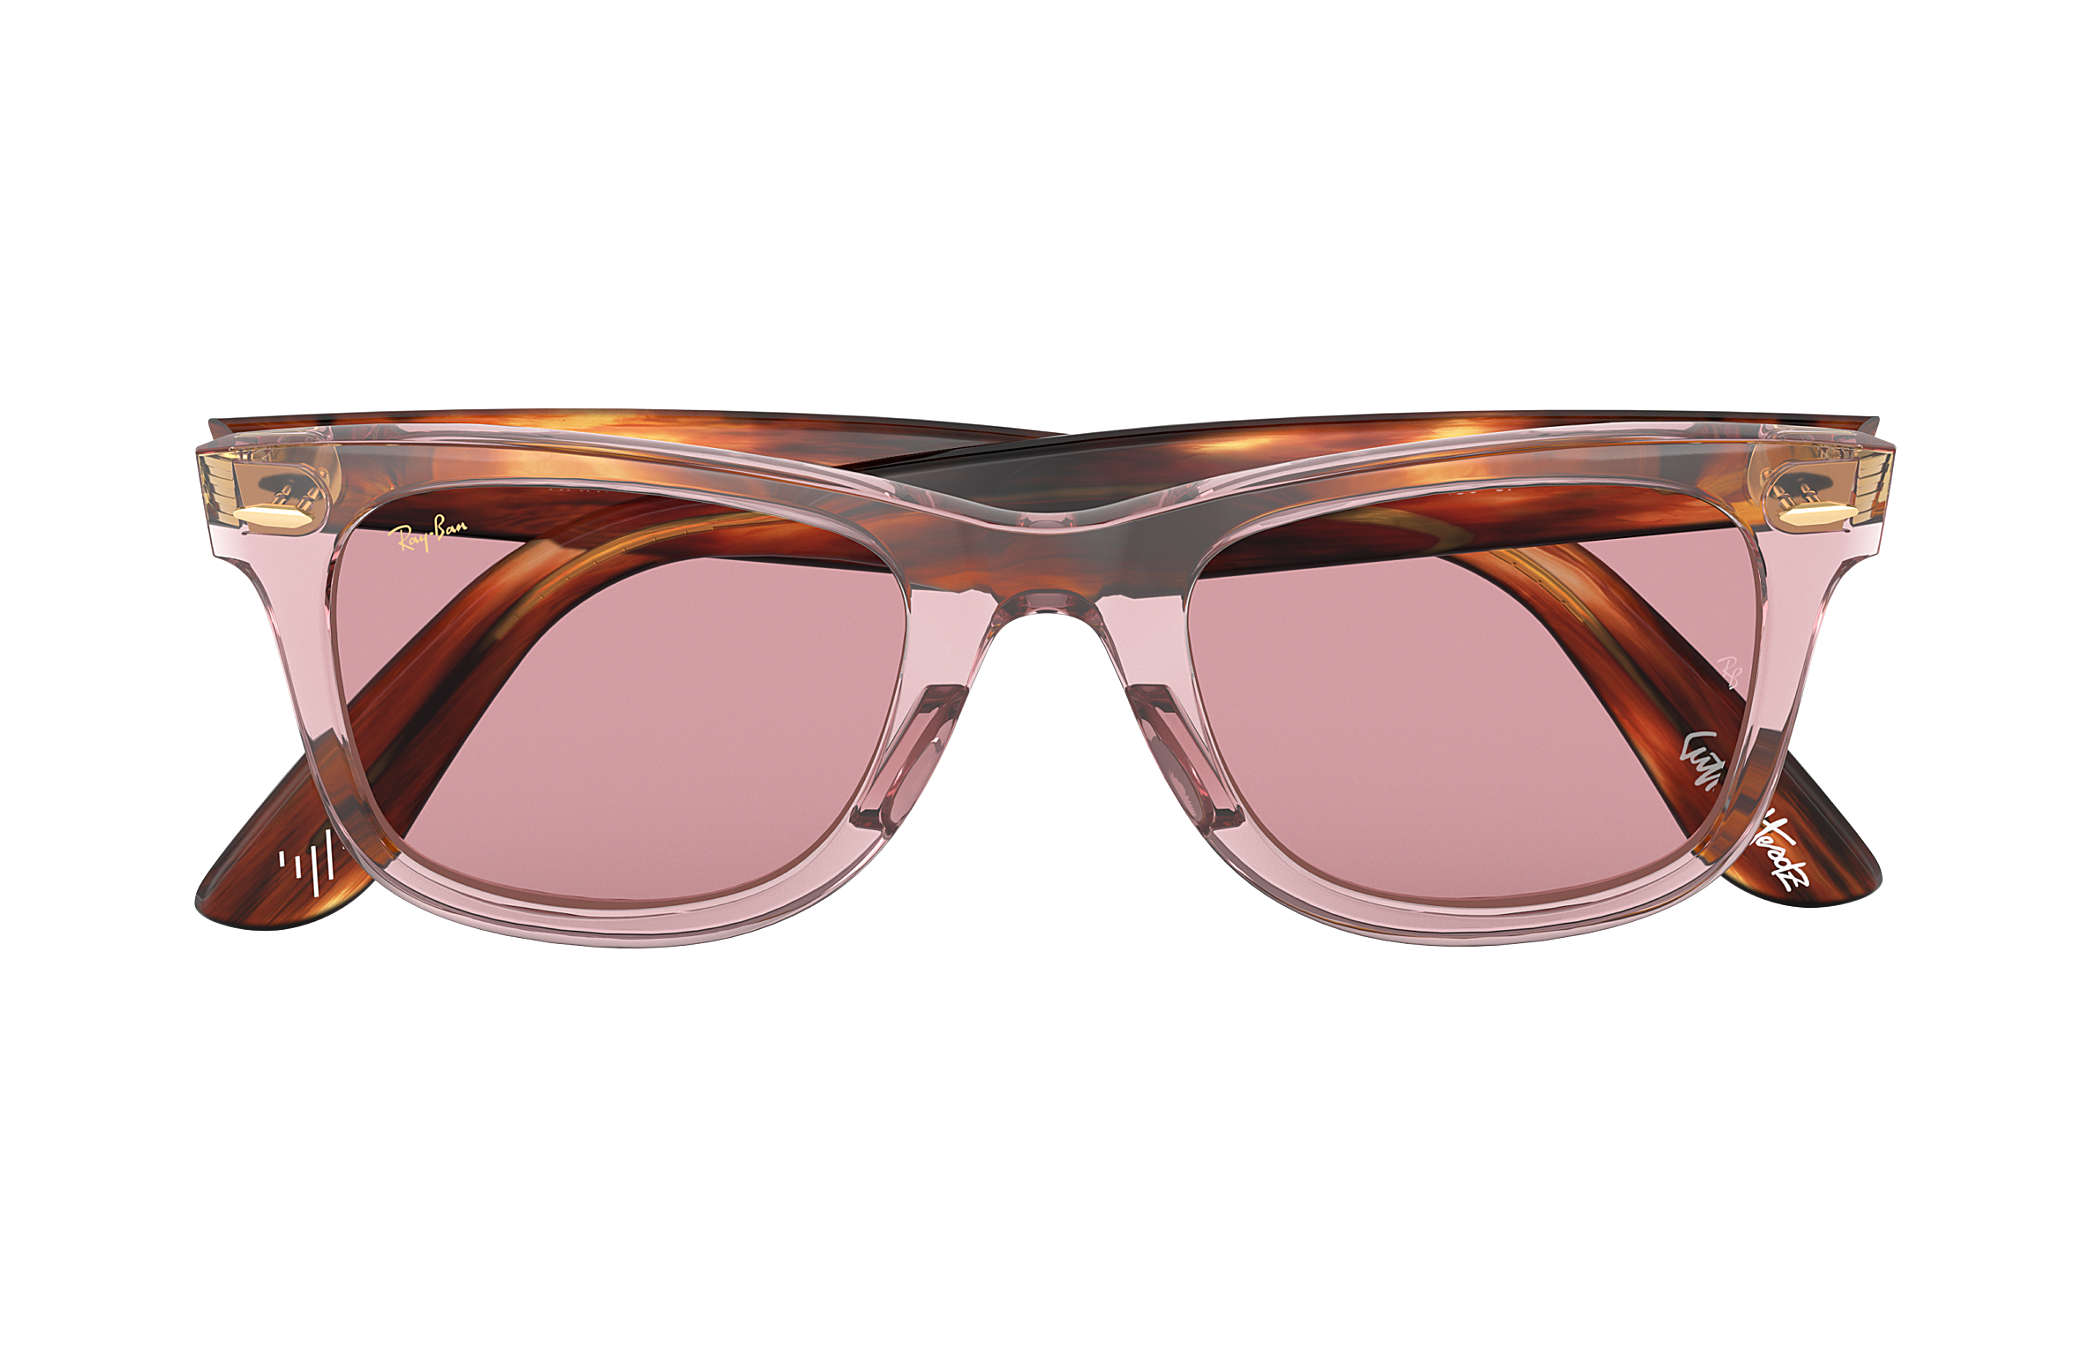 840cc2bb7d ... Ray-Ban 0RB2140-THE MARTINEZ BROTHERS WAYFARER Pink  Tortoise SUN ...